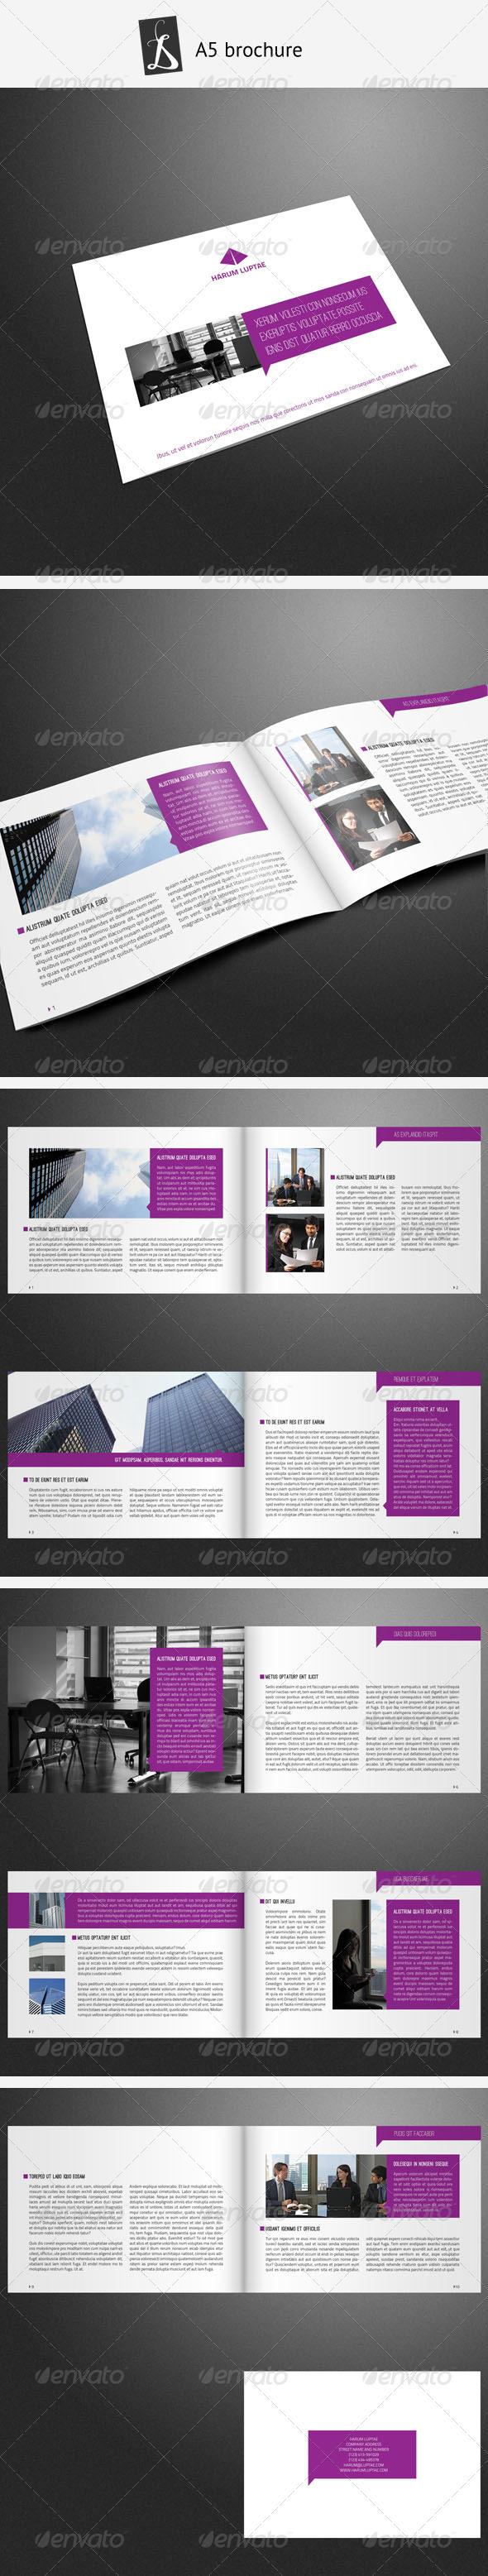 A5 Brochure 8 - Corporate Brochures